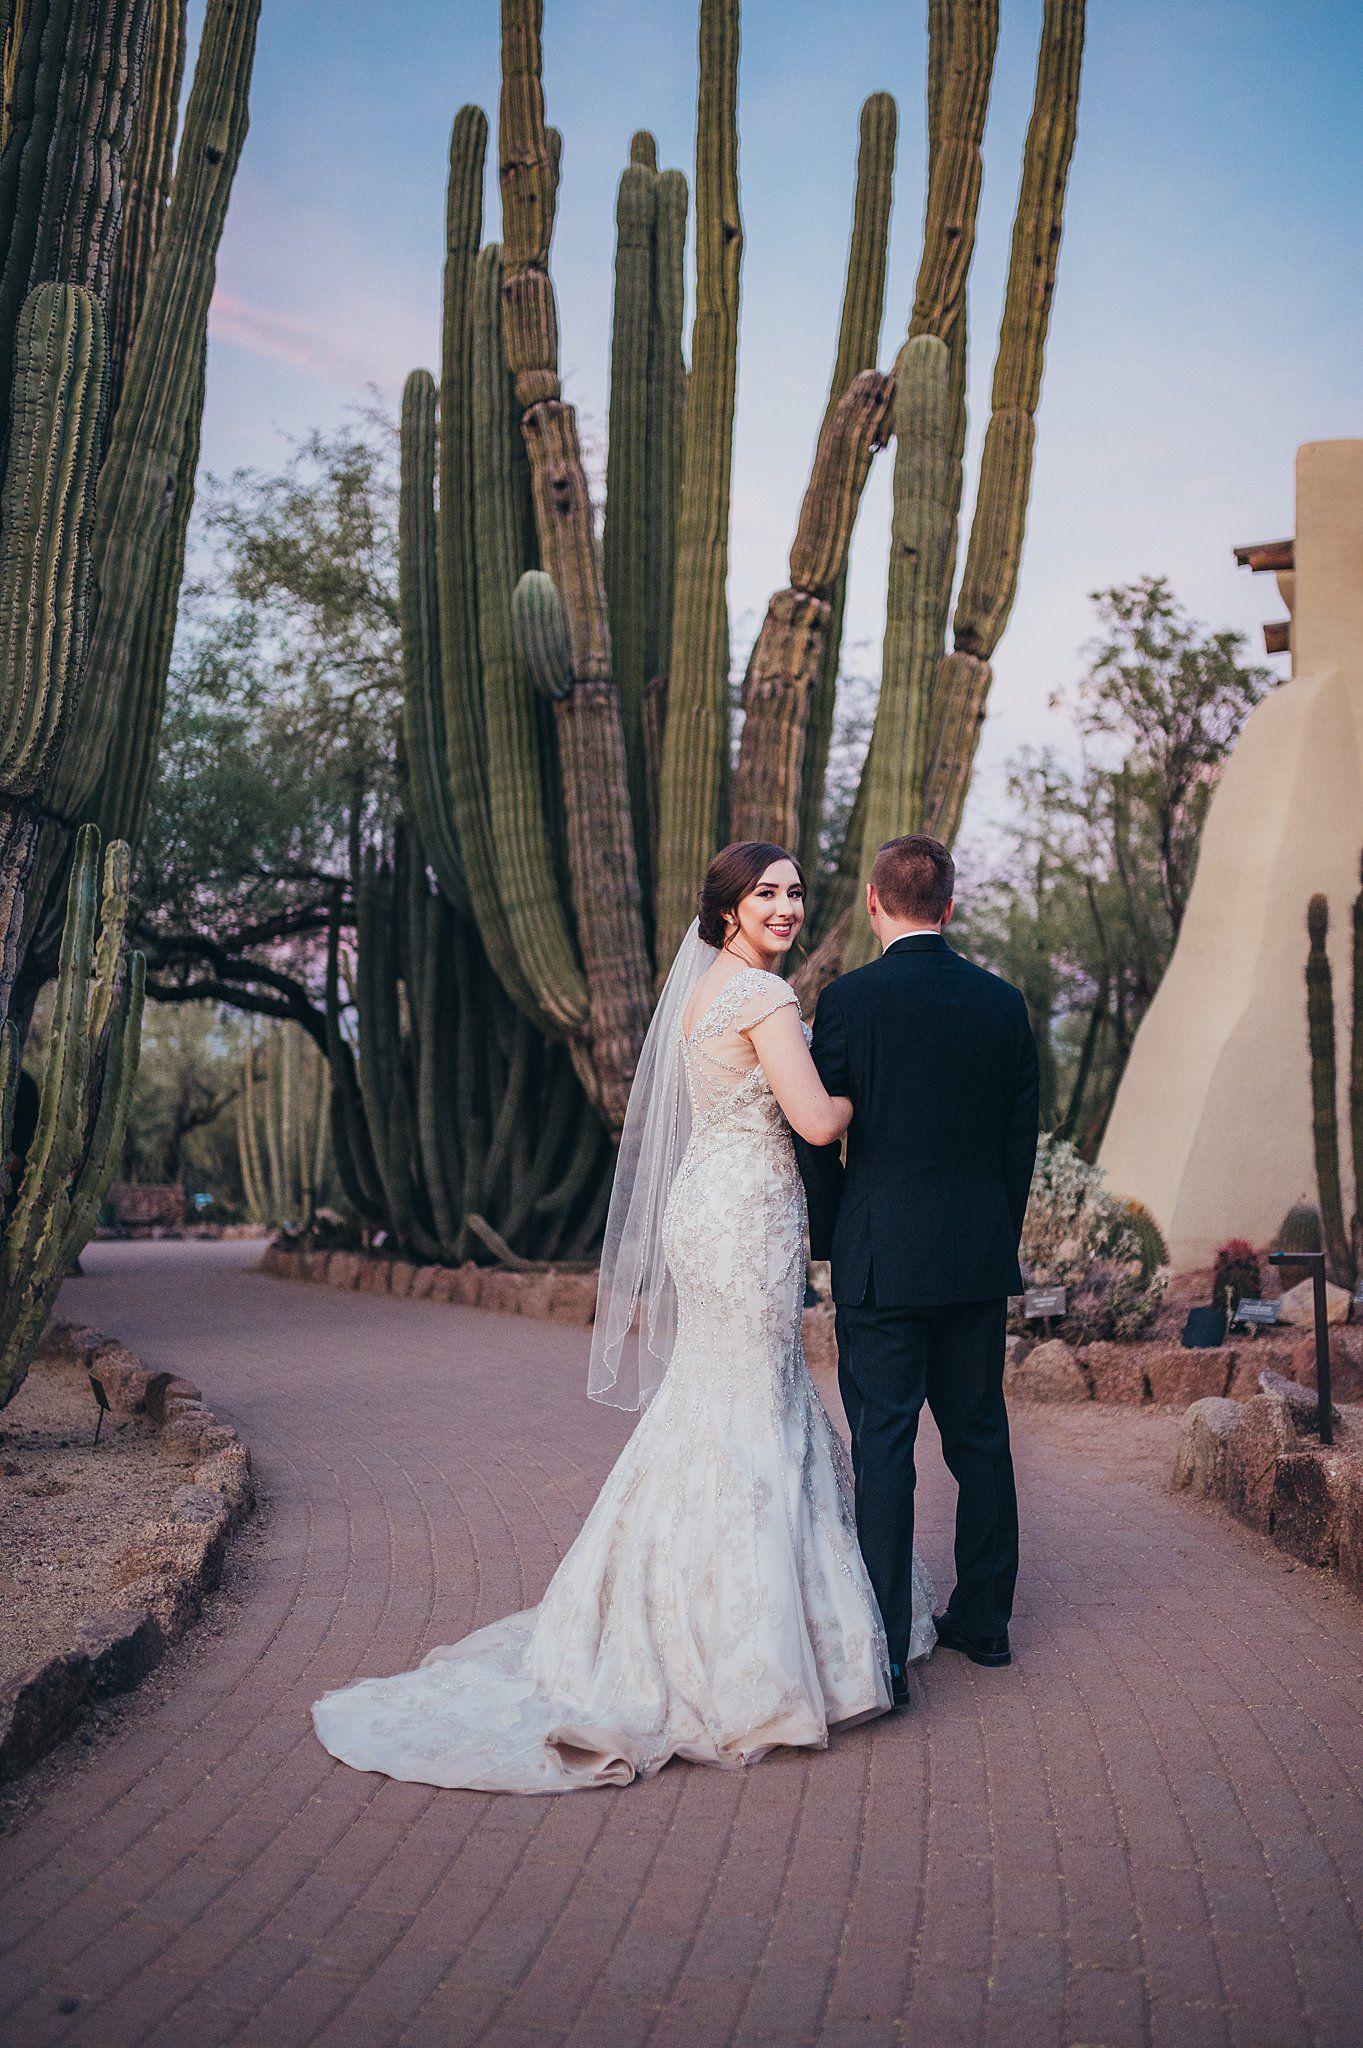 Desert Botanical Garden Wedding in 2020 Garden wedding